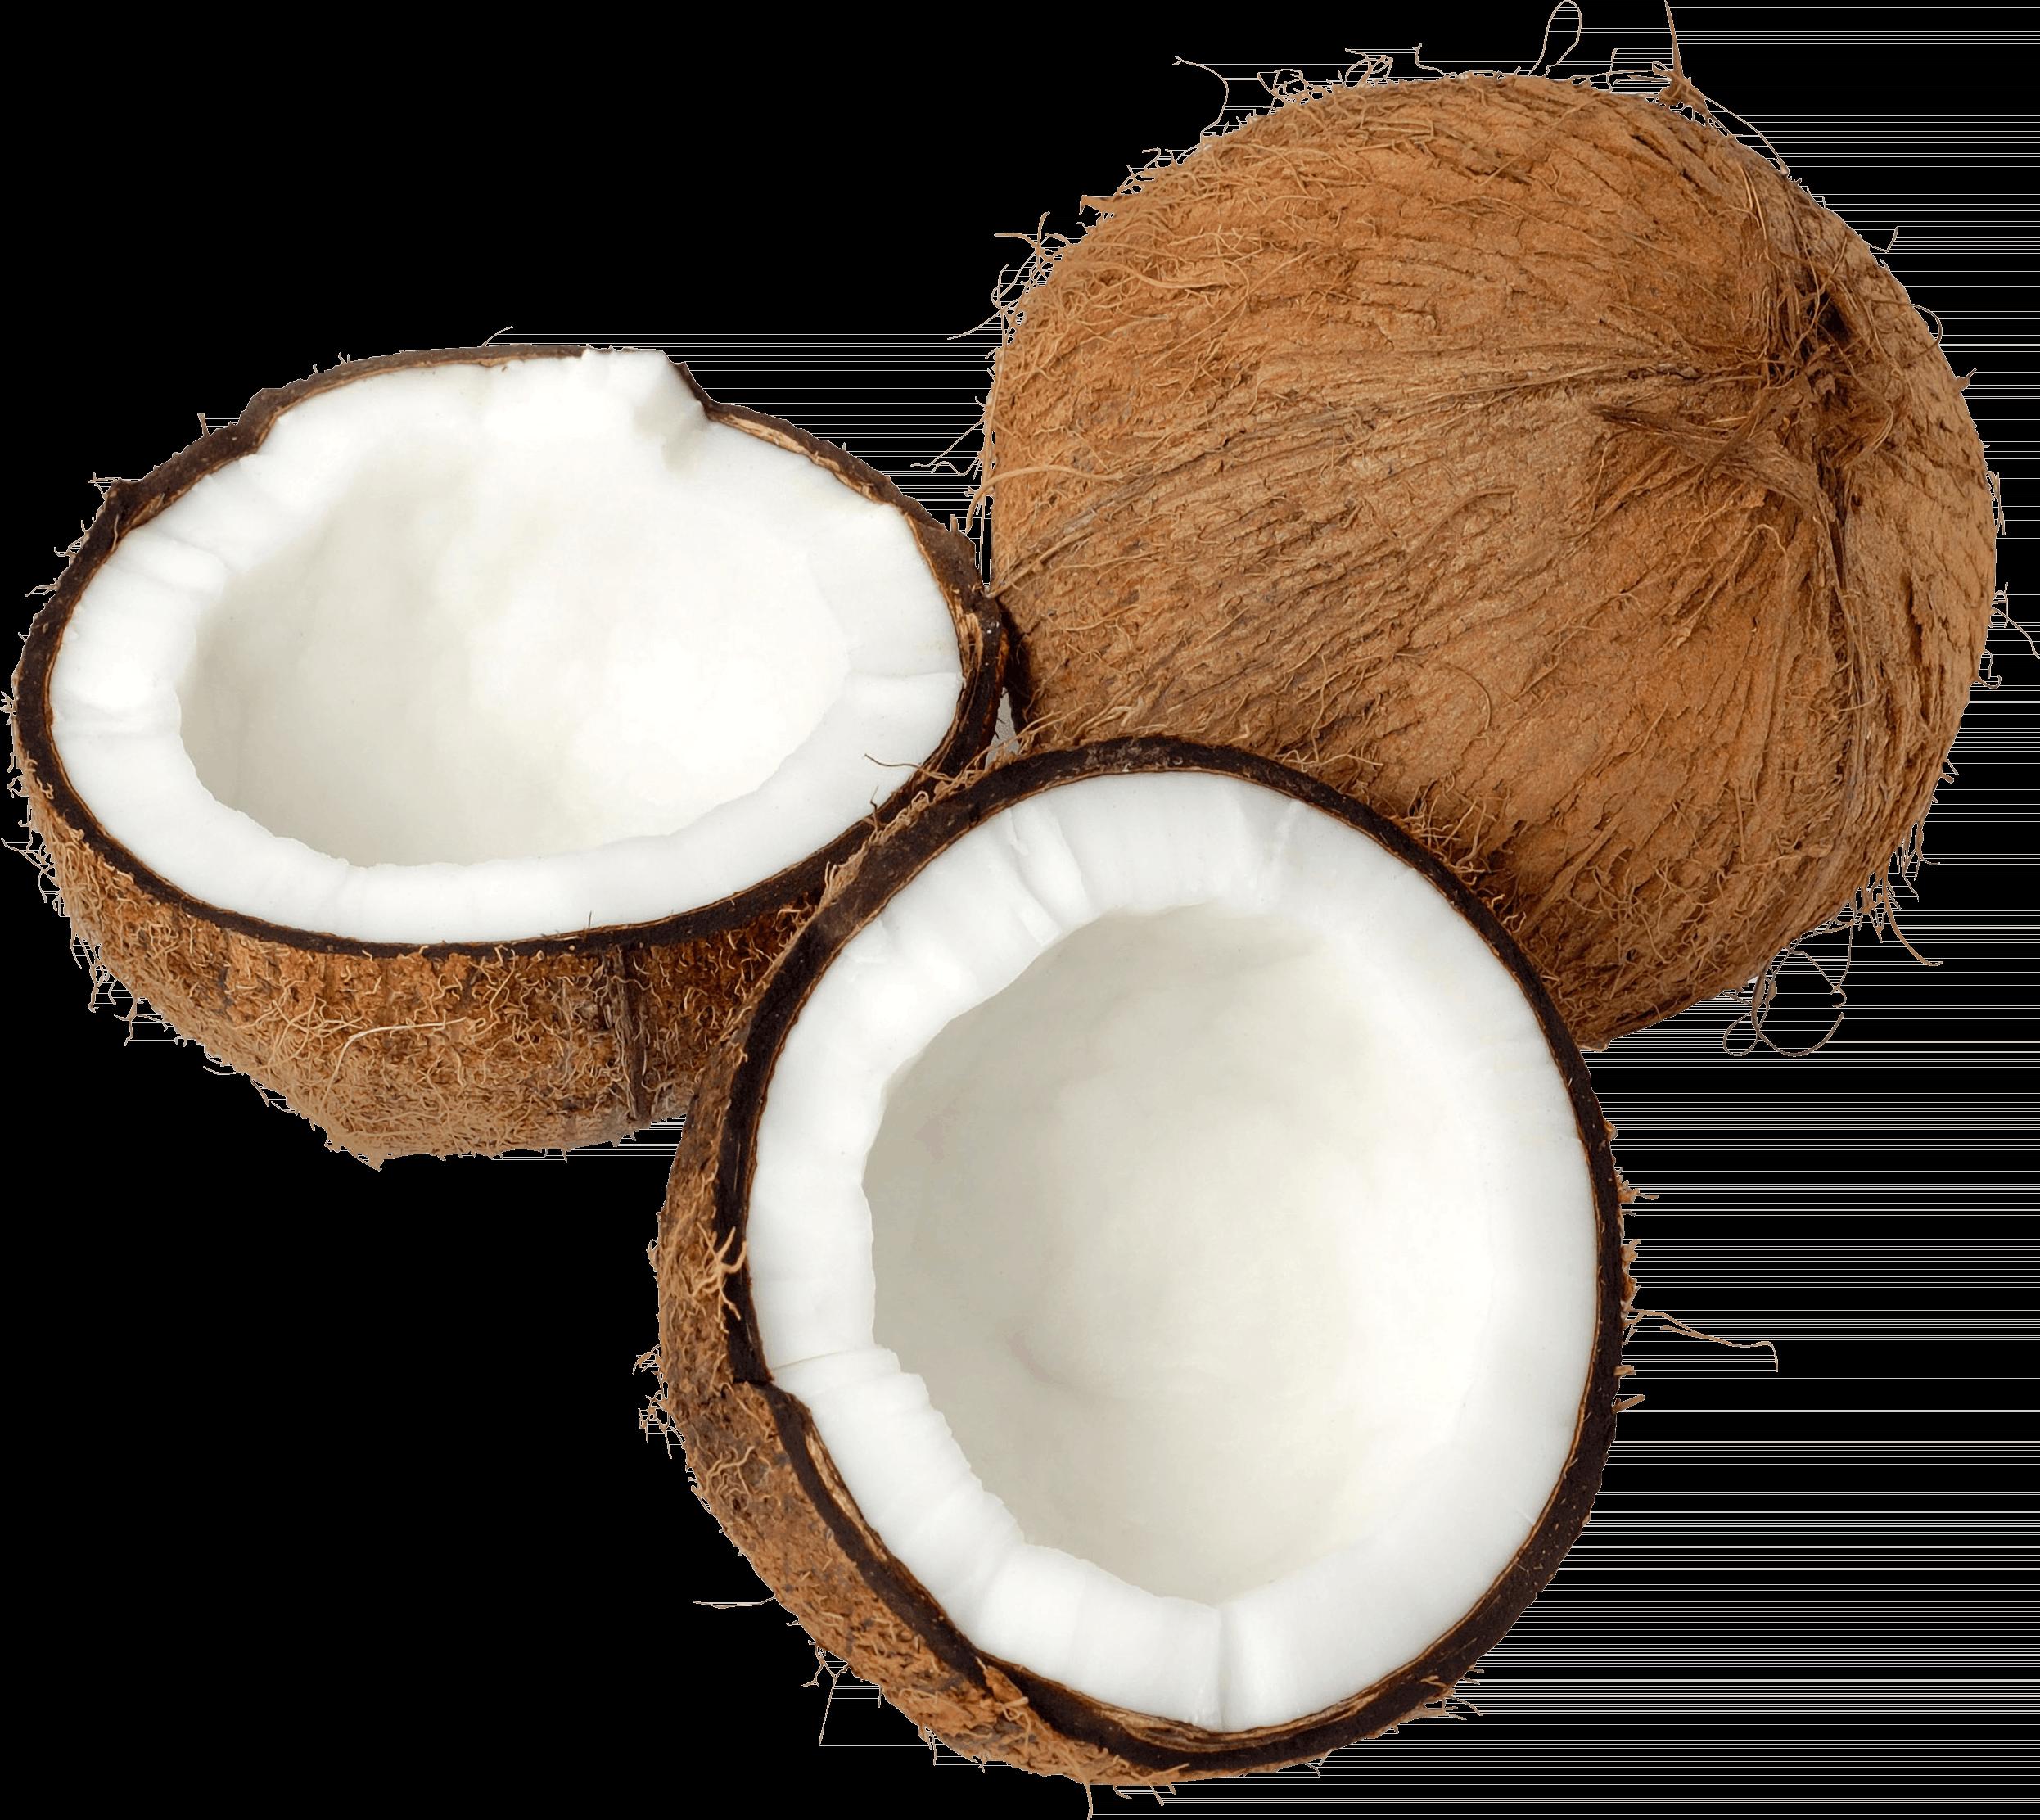 Coconut Trio Open transparent PNG.